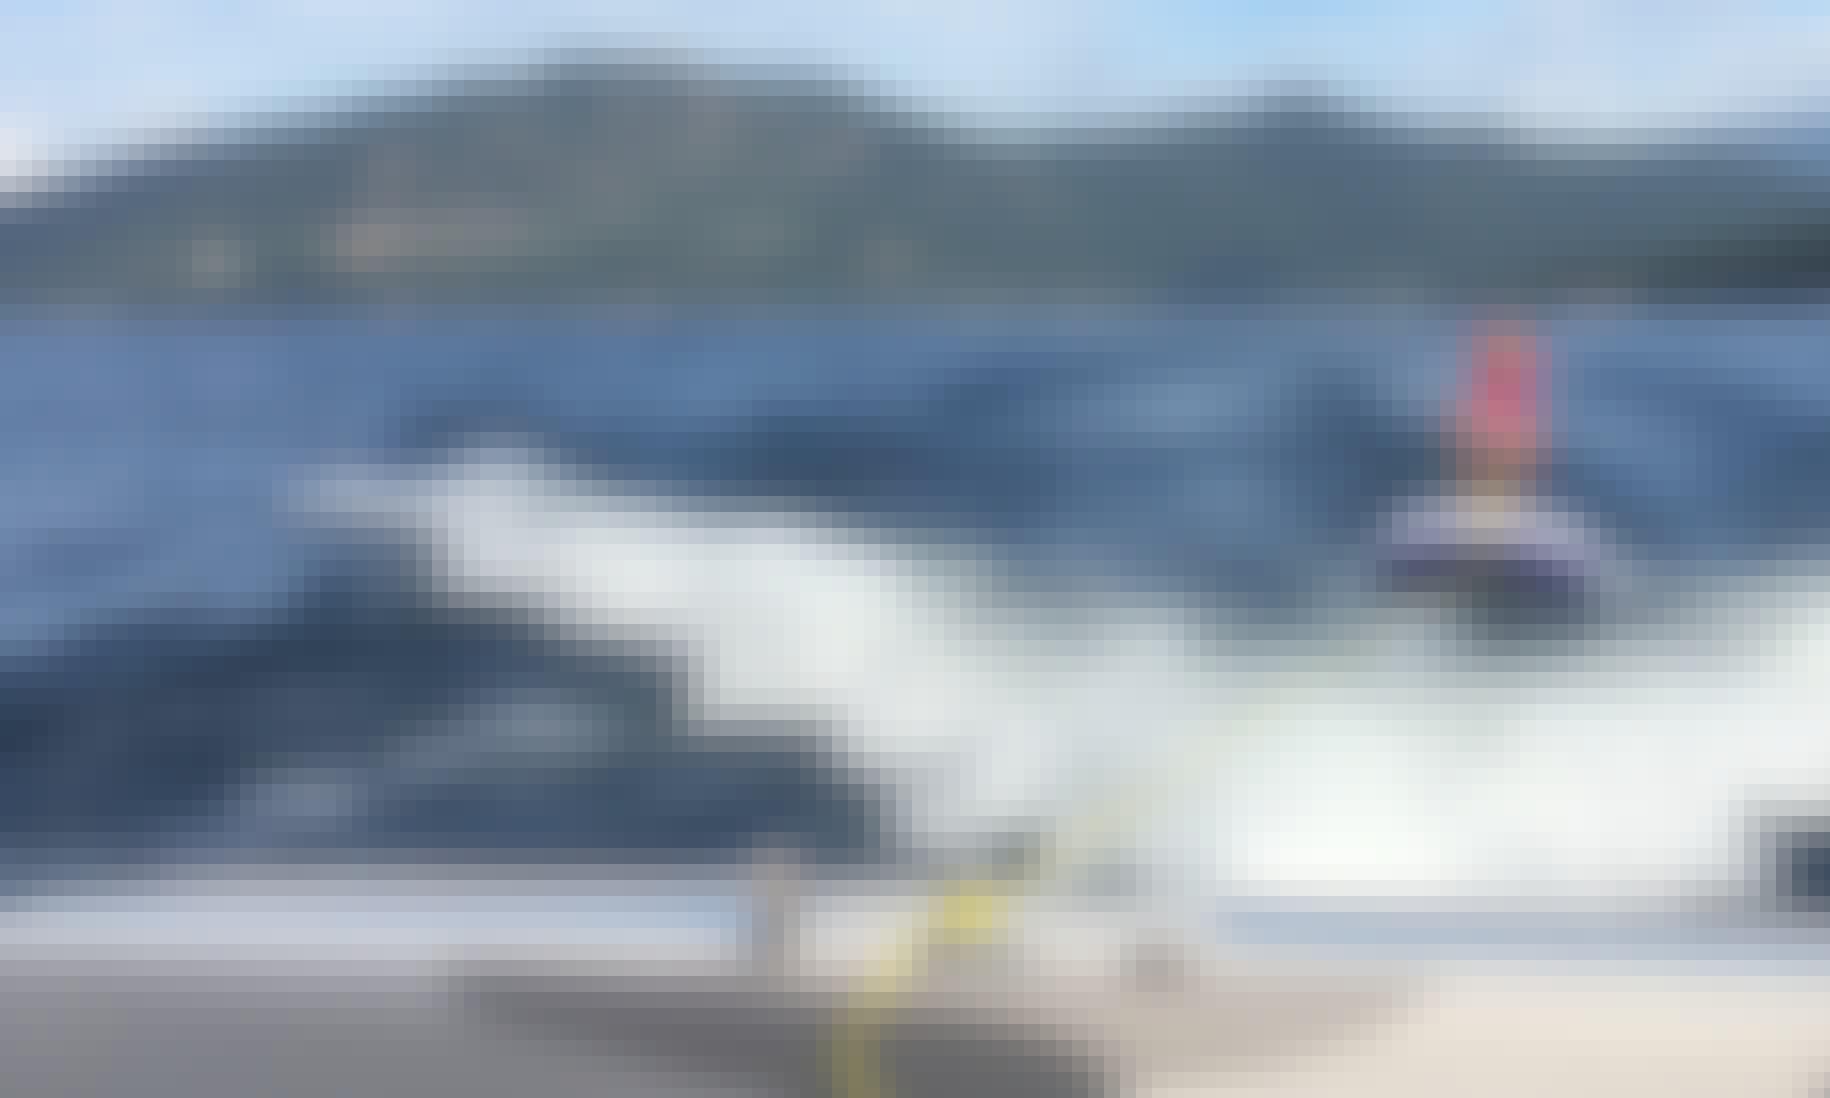 24 MXZ Malibu Wakesetter for rent in the Shuswap Lake, South Thompson River, Monte Lake area's.